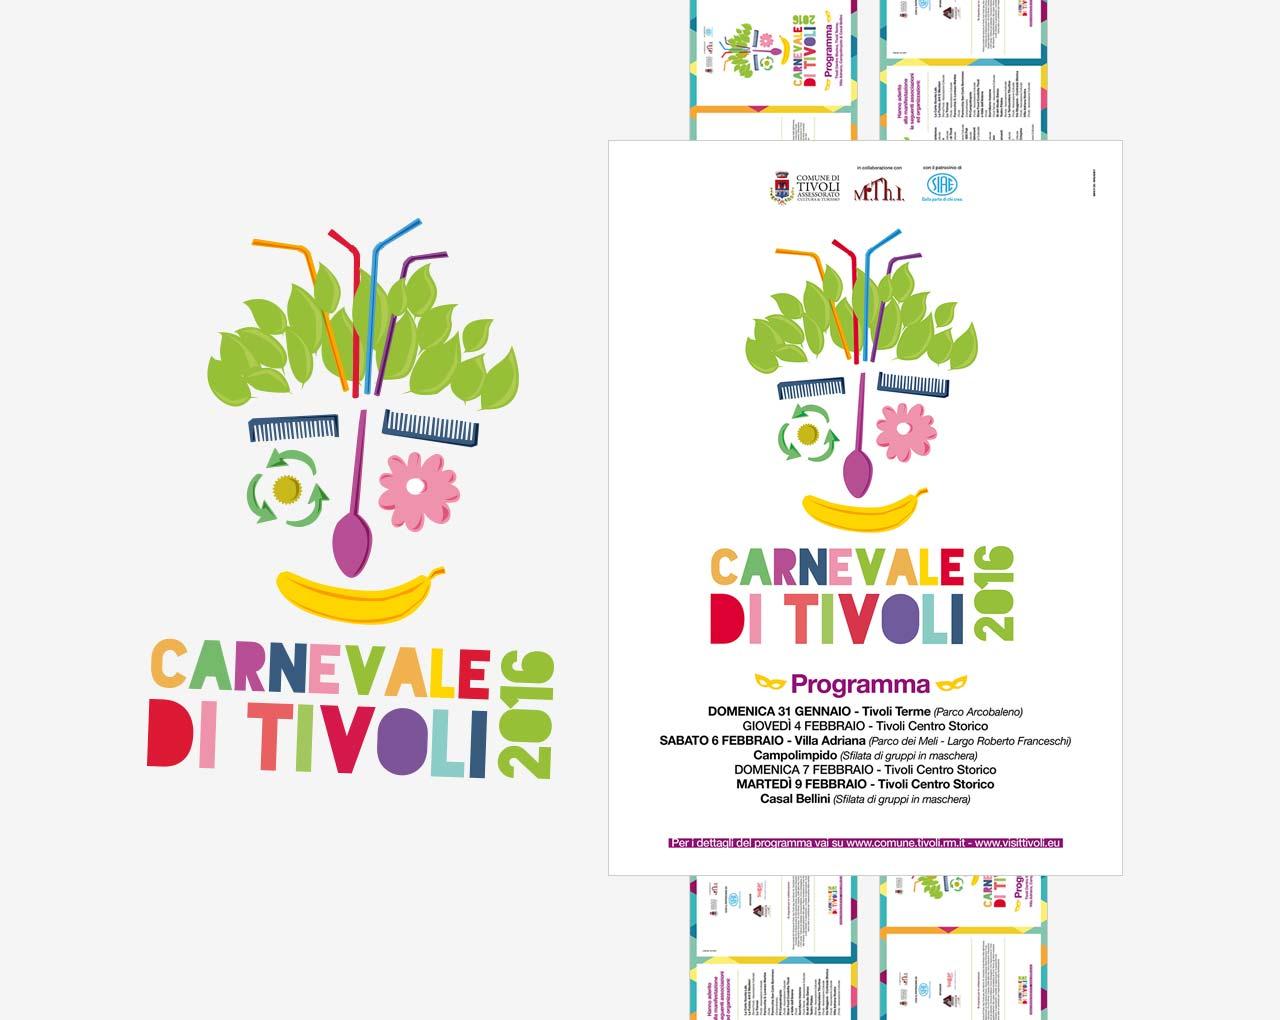 Carnevale di Tivoli 2016